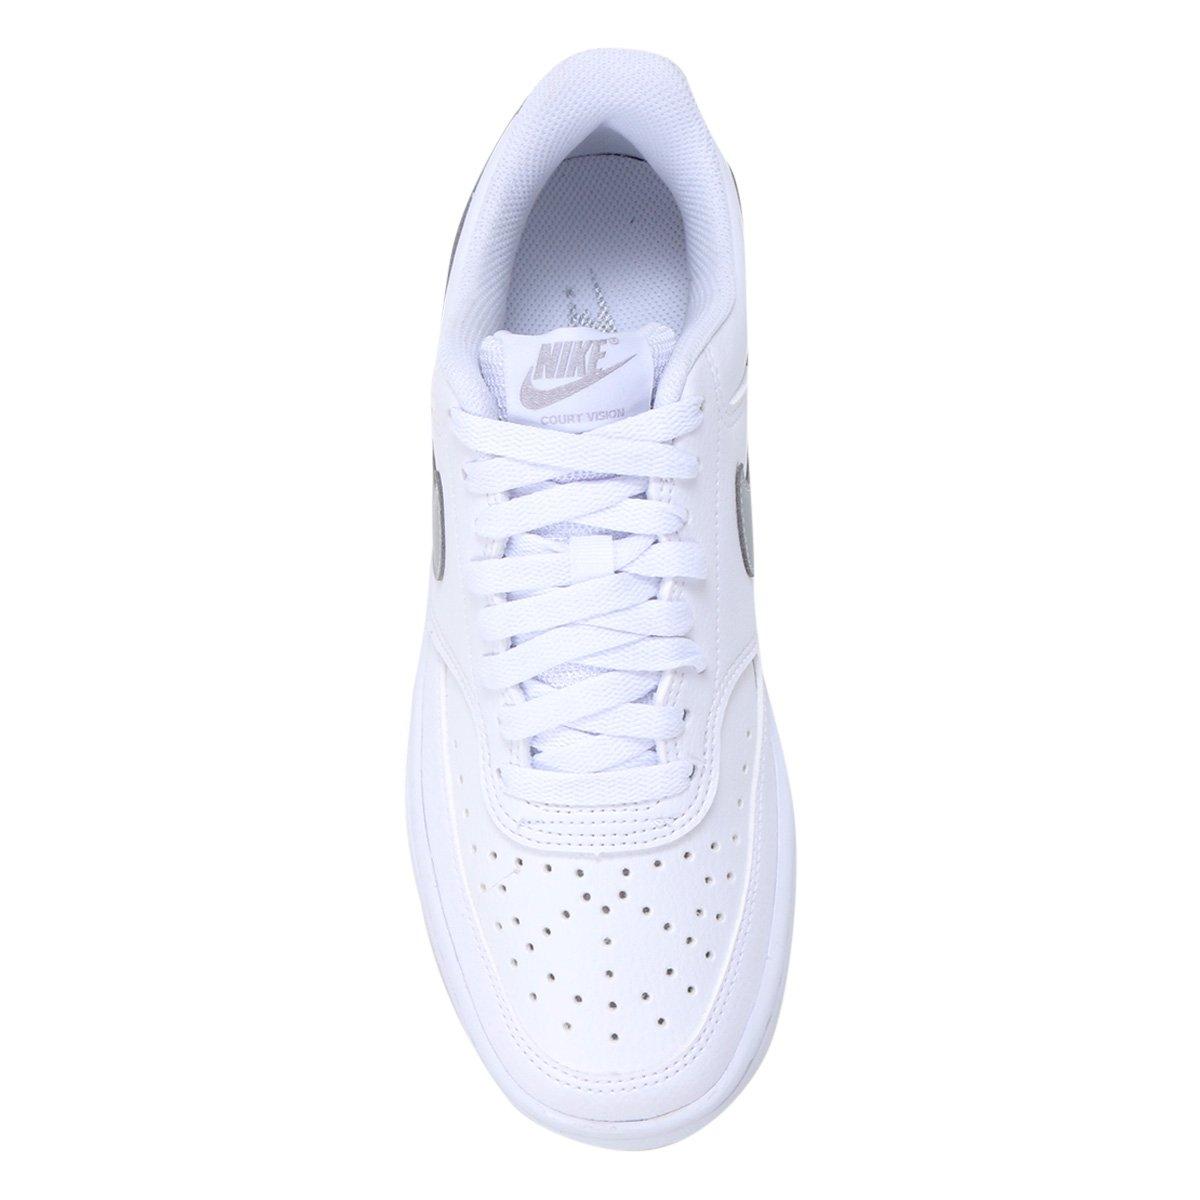 Tênis Feminino Nike Couro Court Vision Low